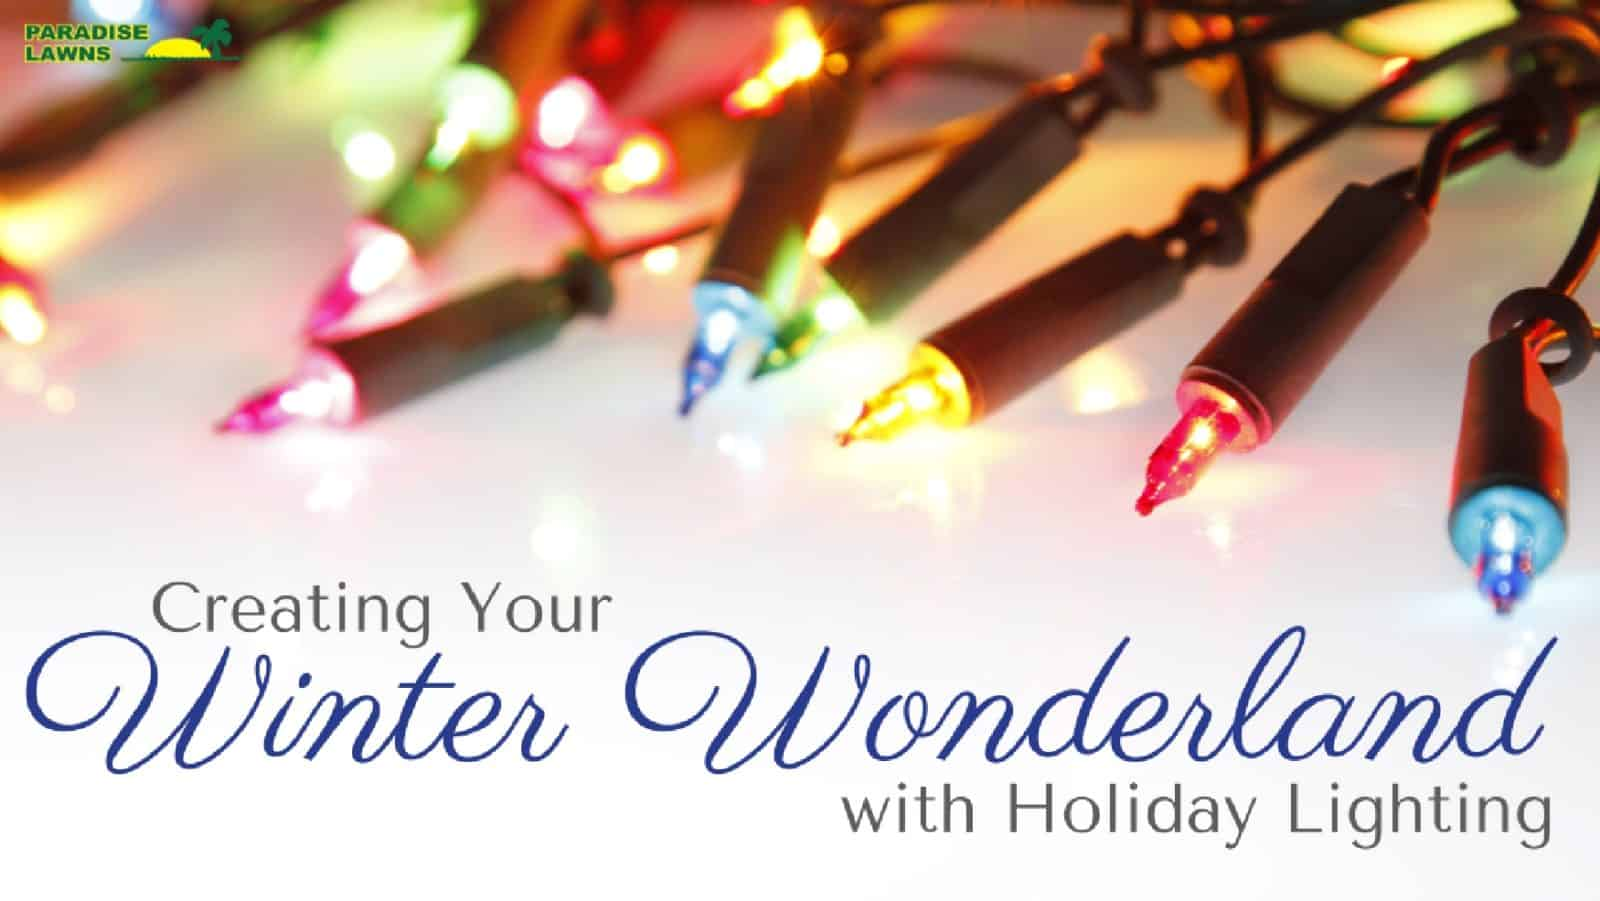 omaha holiday lighting service